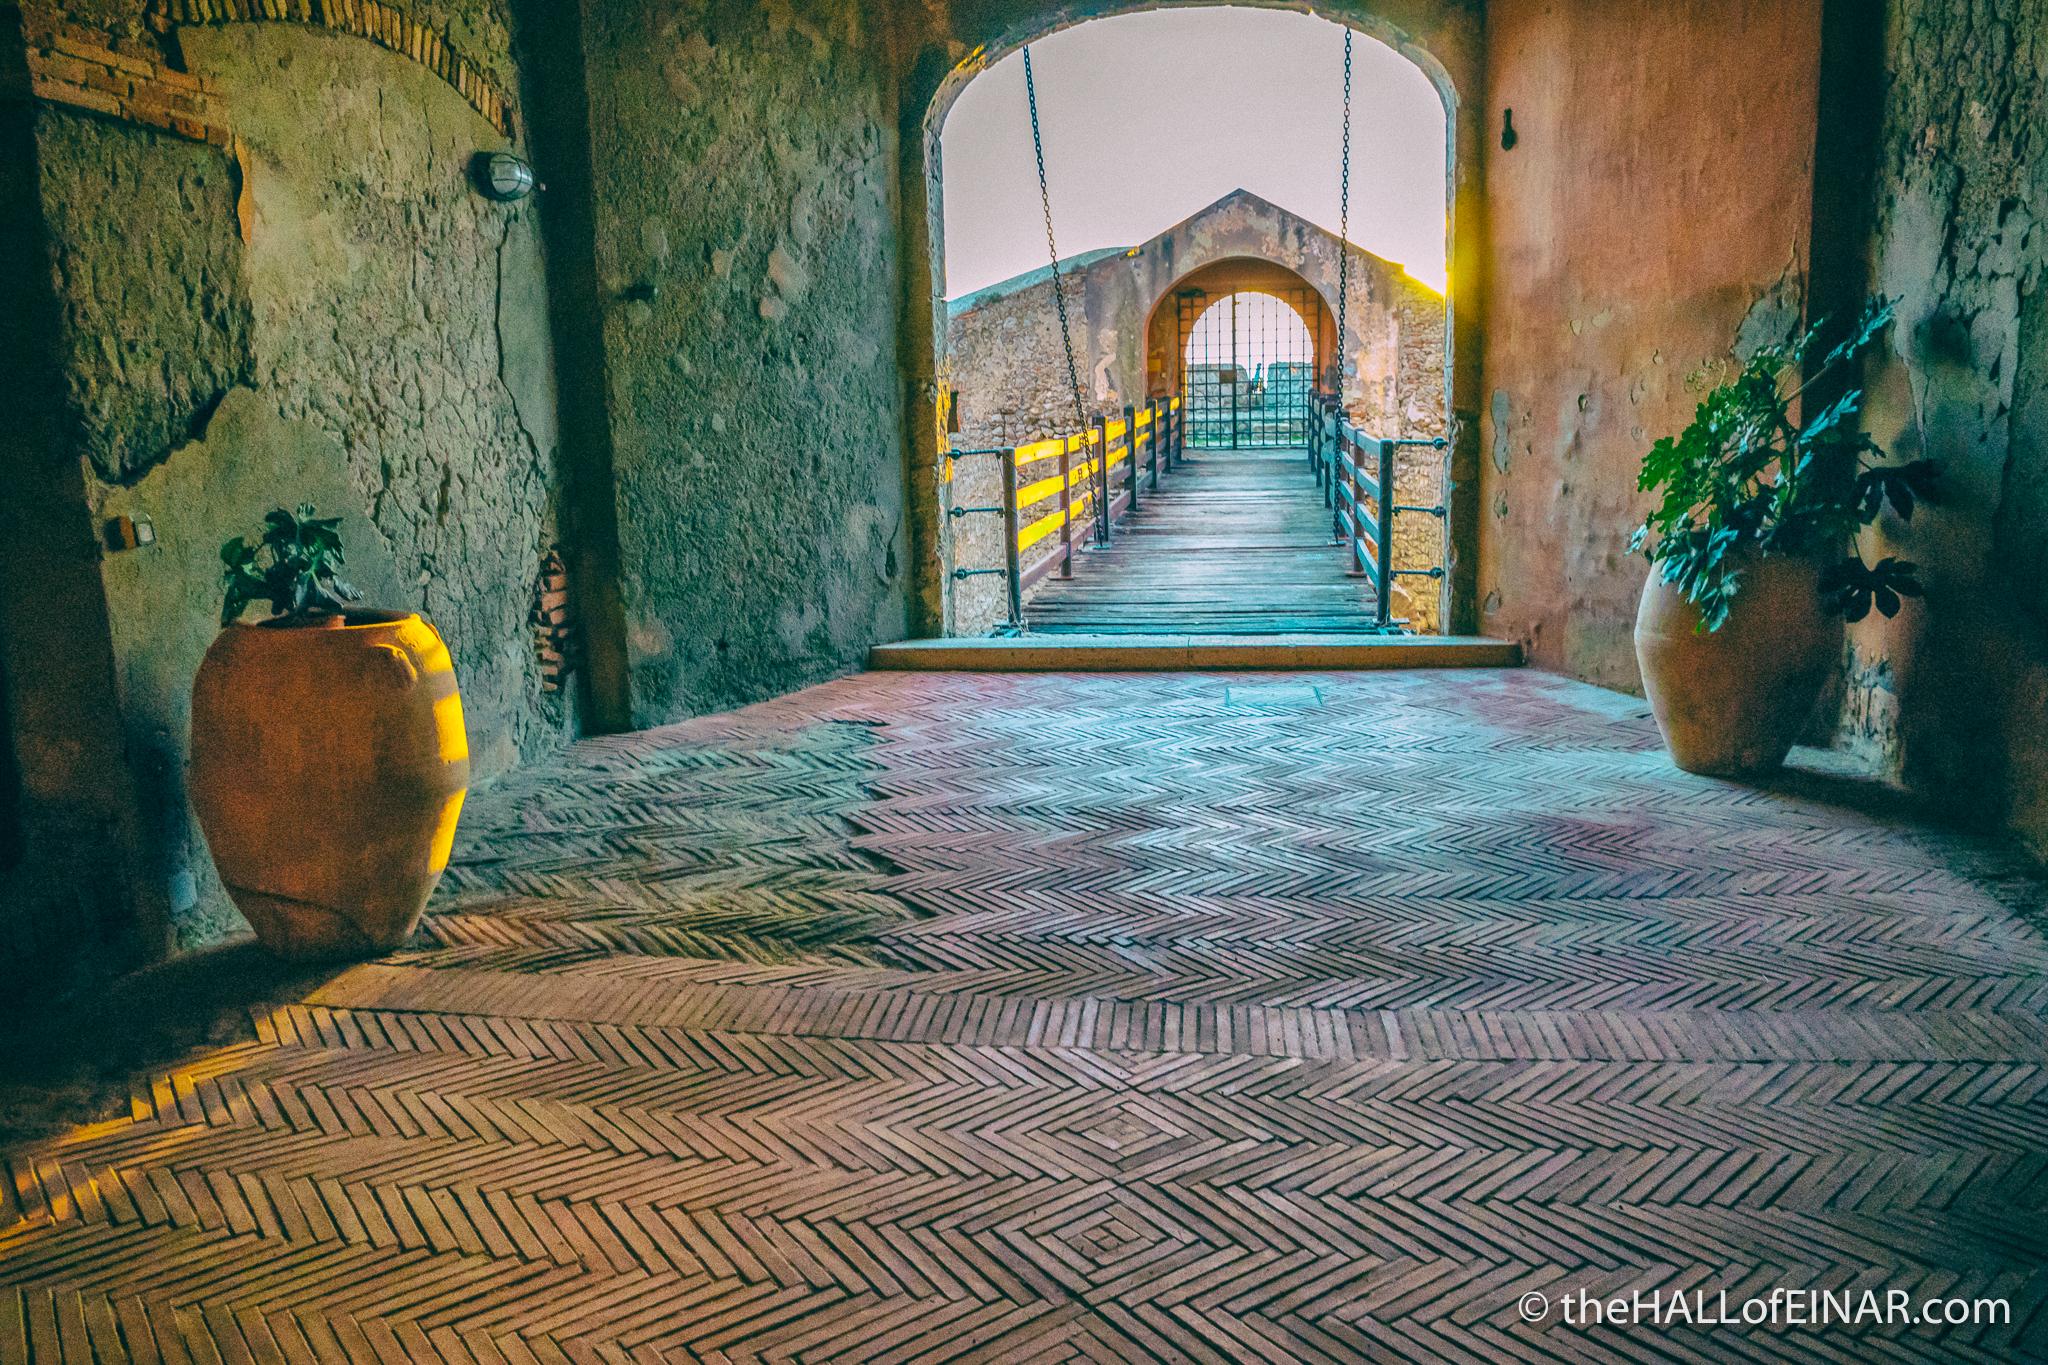 Porto Ercole - The Hall of Einar - photograph (c) David Bailey (not the)